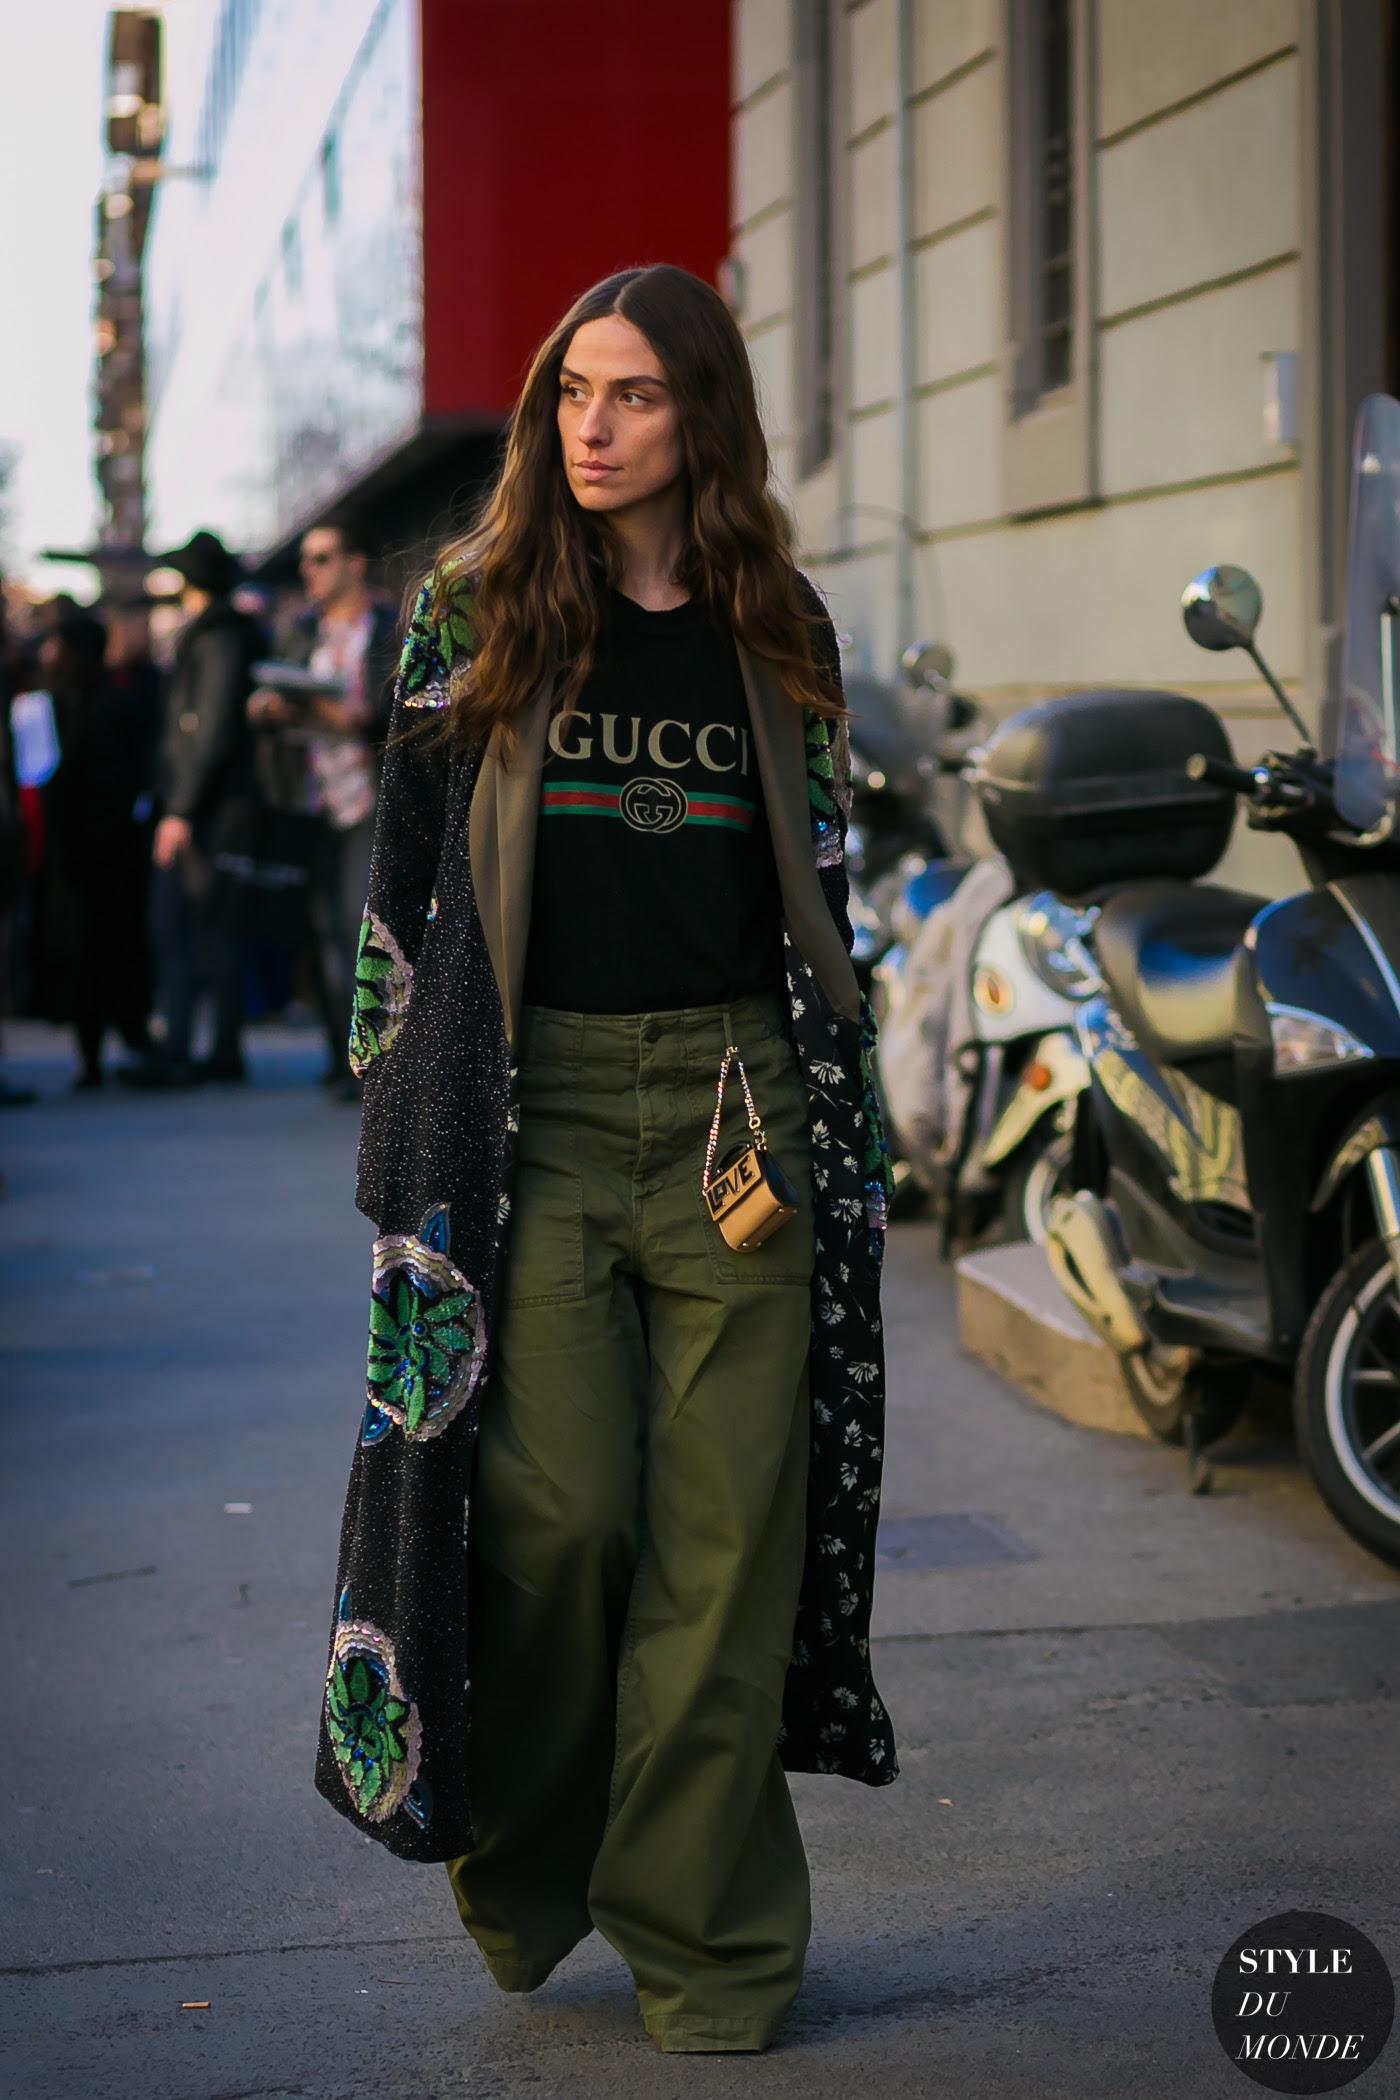 http://www.styledumonde.com/wp-content/uploads/2017/01/Erika-Boldrin-by-STYLEDUMONDE-Street-Style-Fashion-Photography0E2A4909-700x1050@2x.jpg